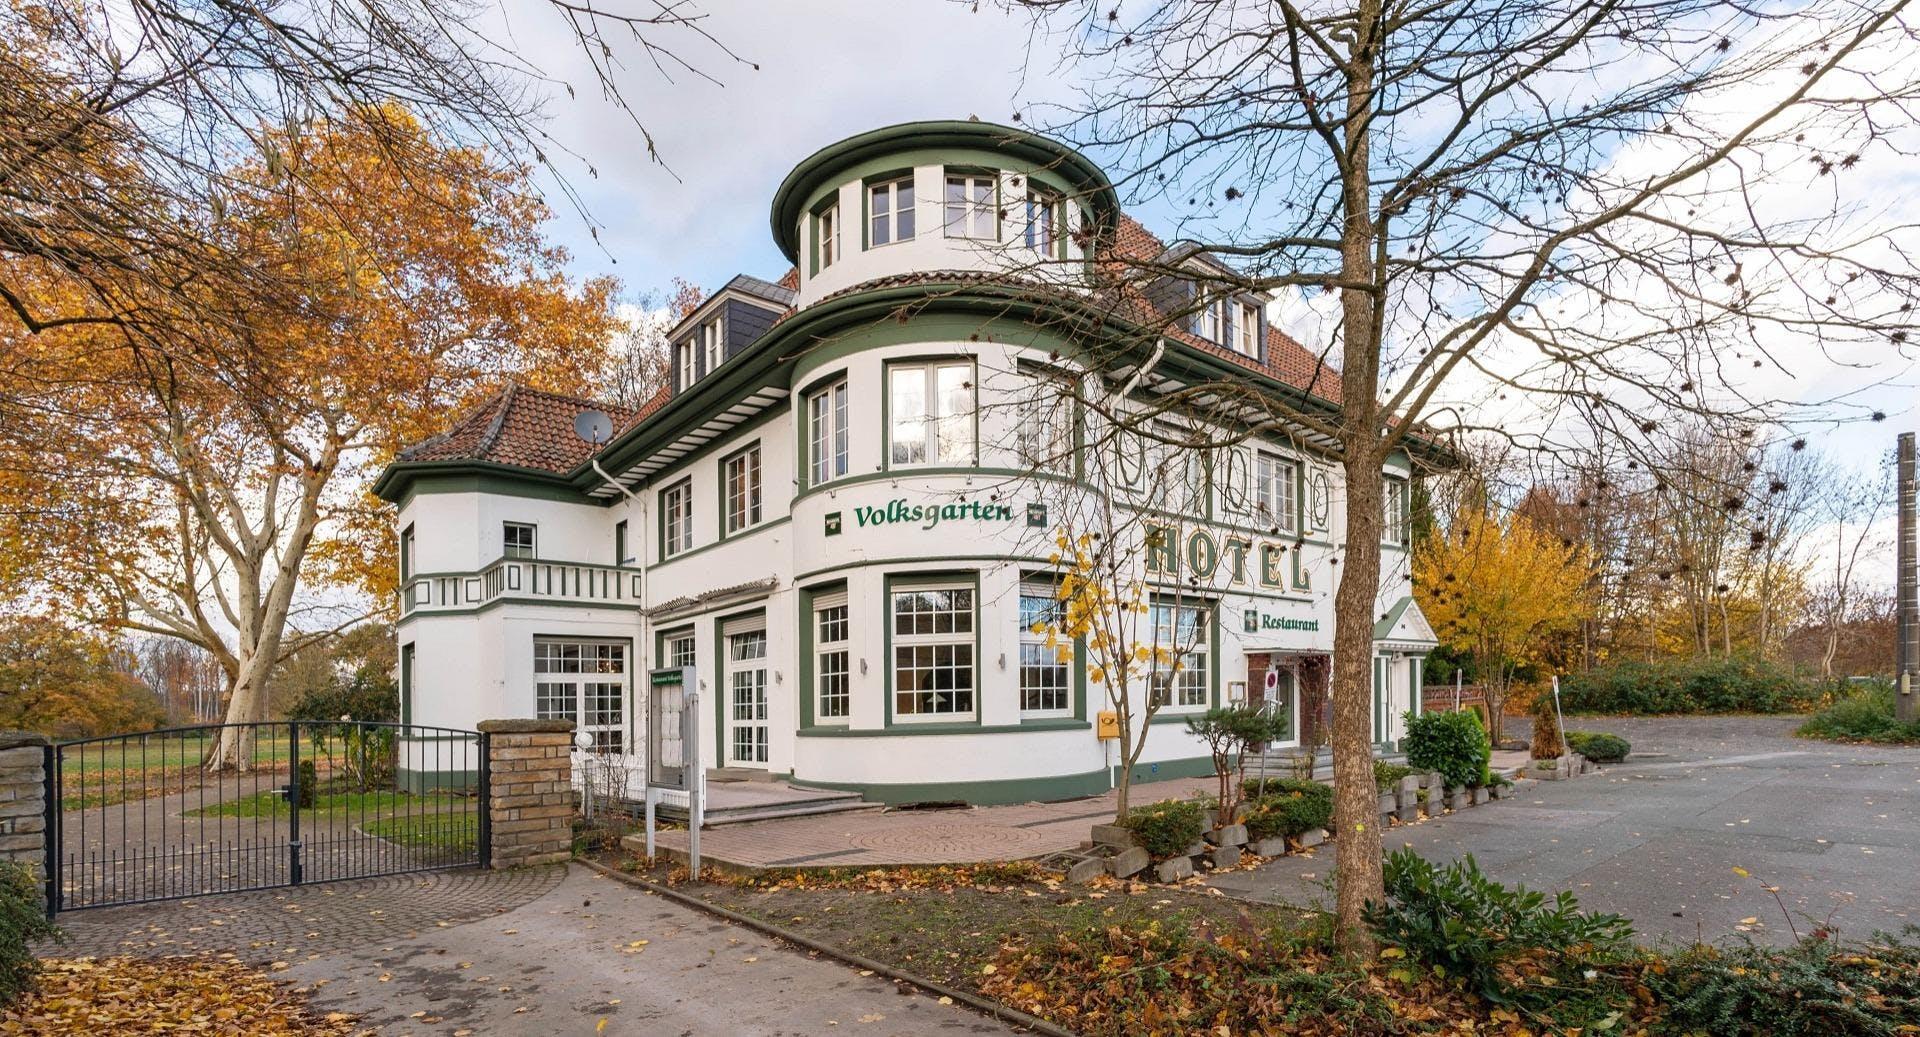 Mengeder Volksgarten Dortmund image 2